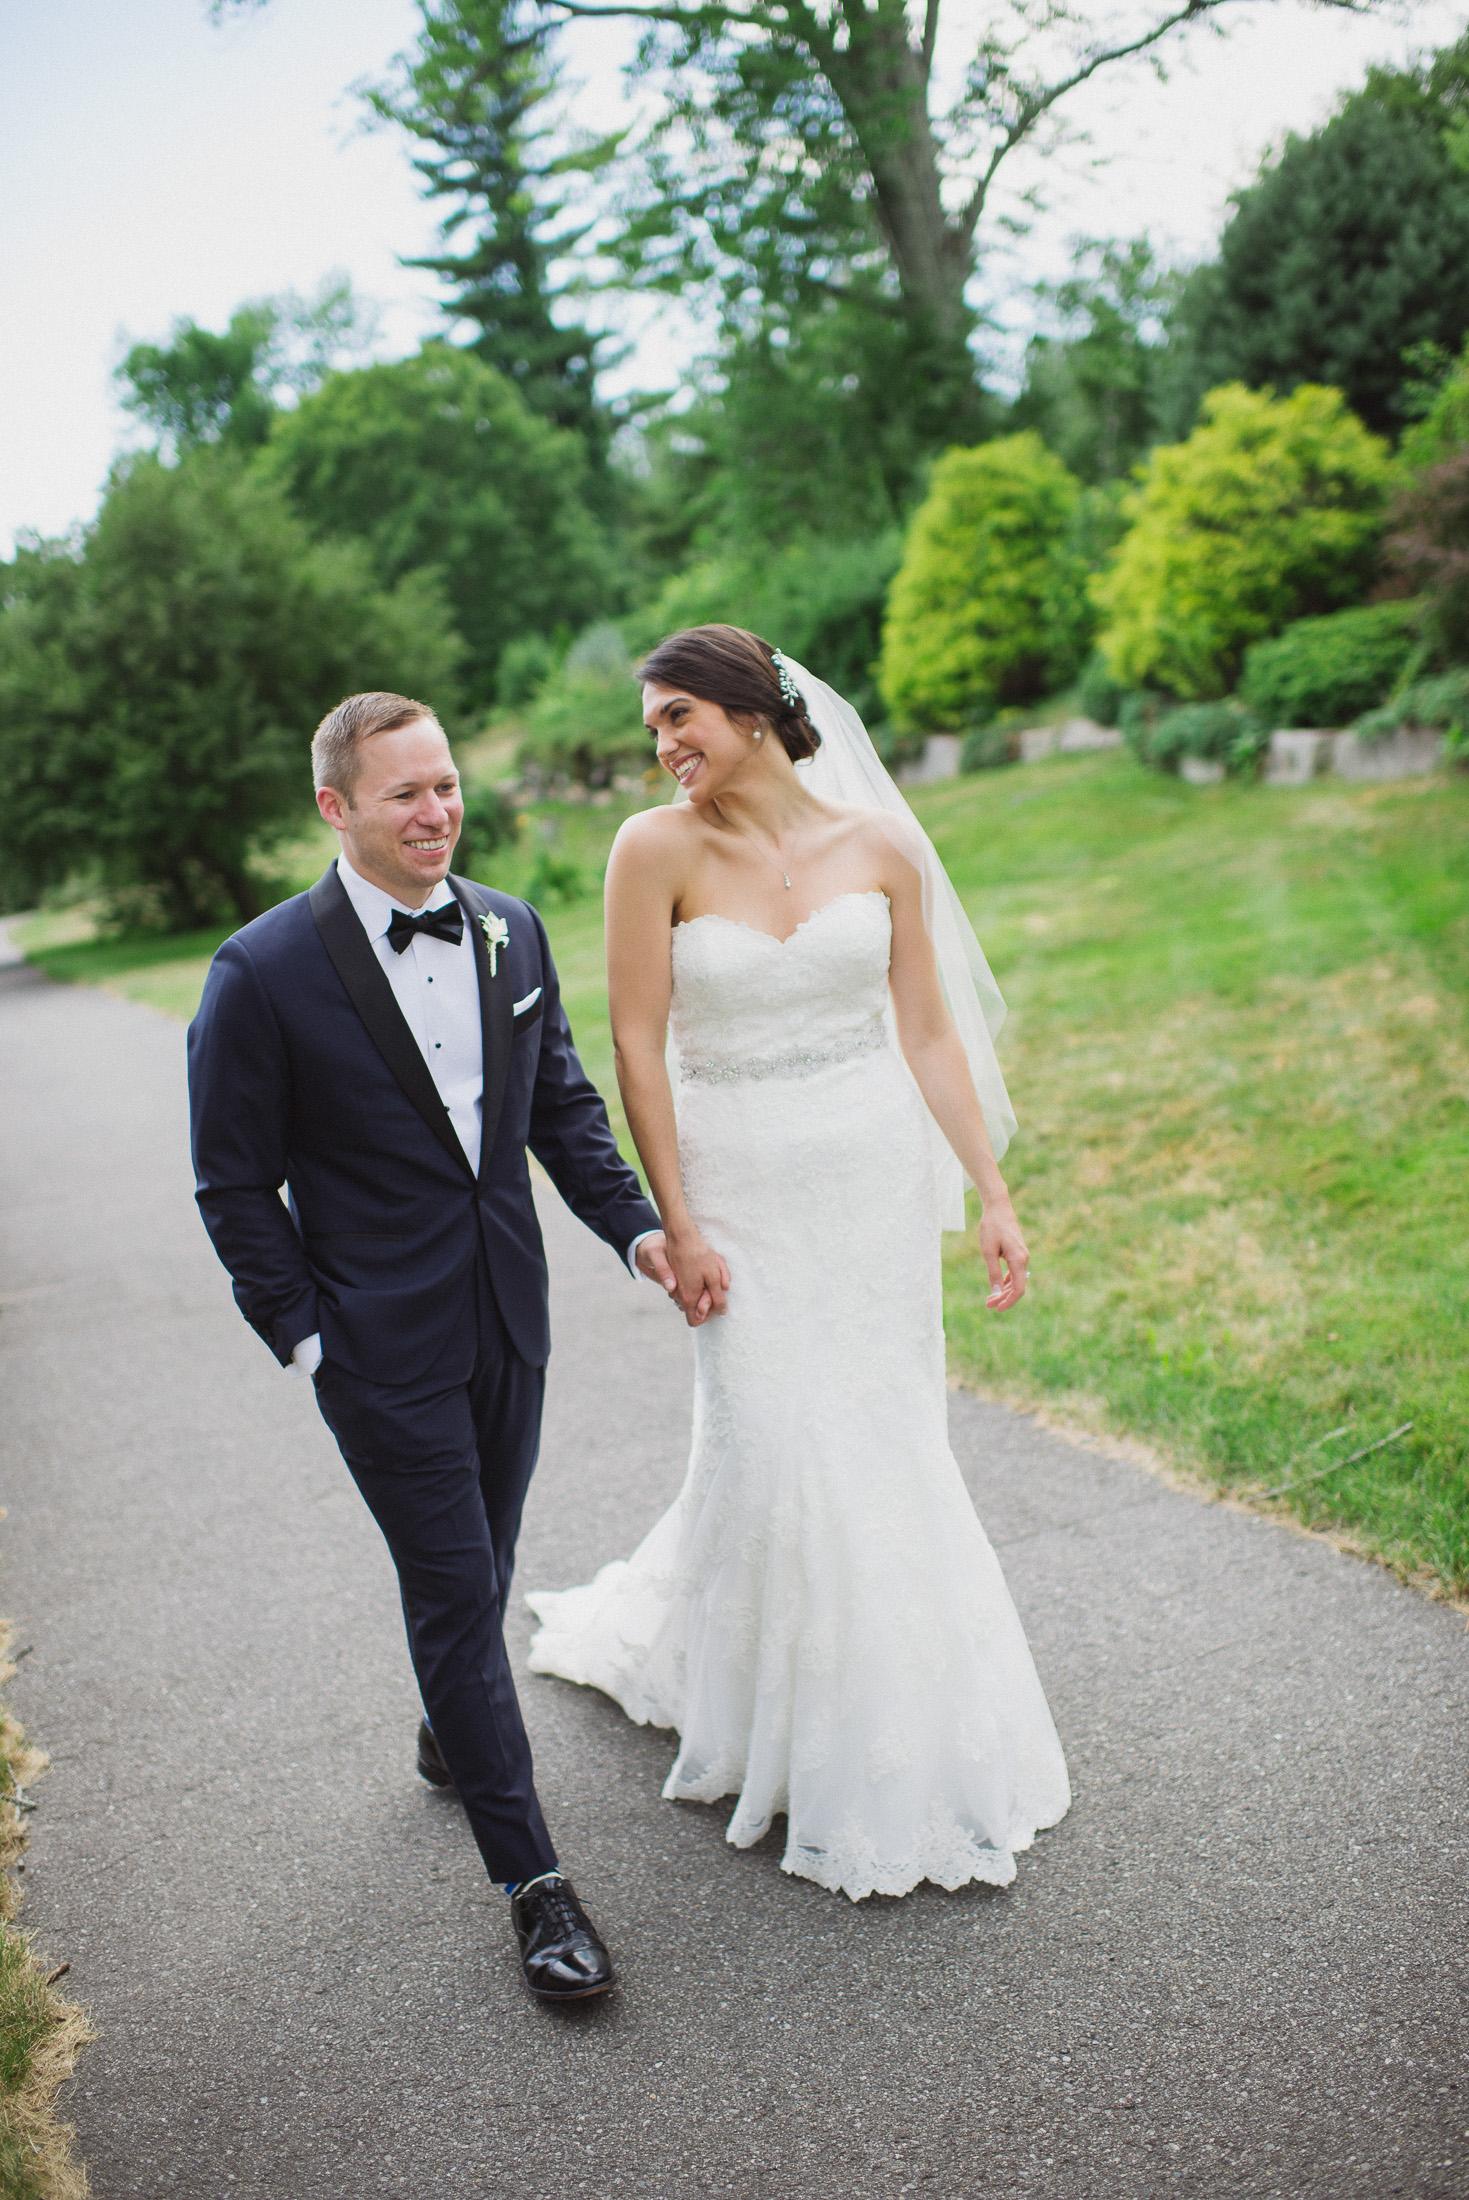 NH Wedding Photographer: walking on path at BVI